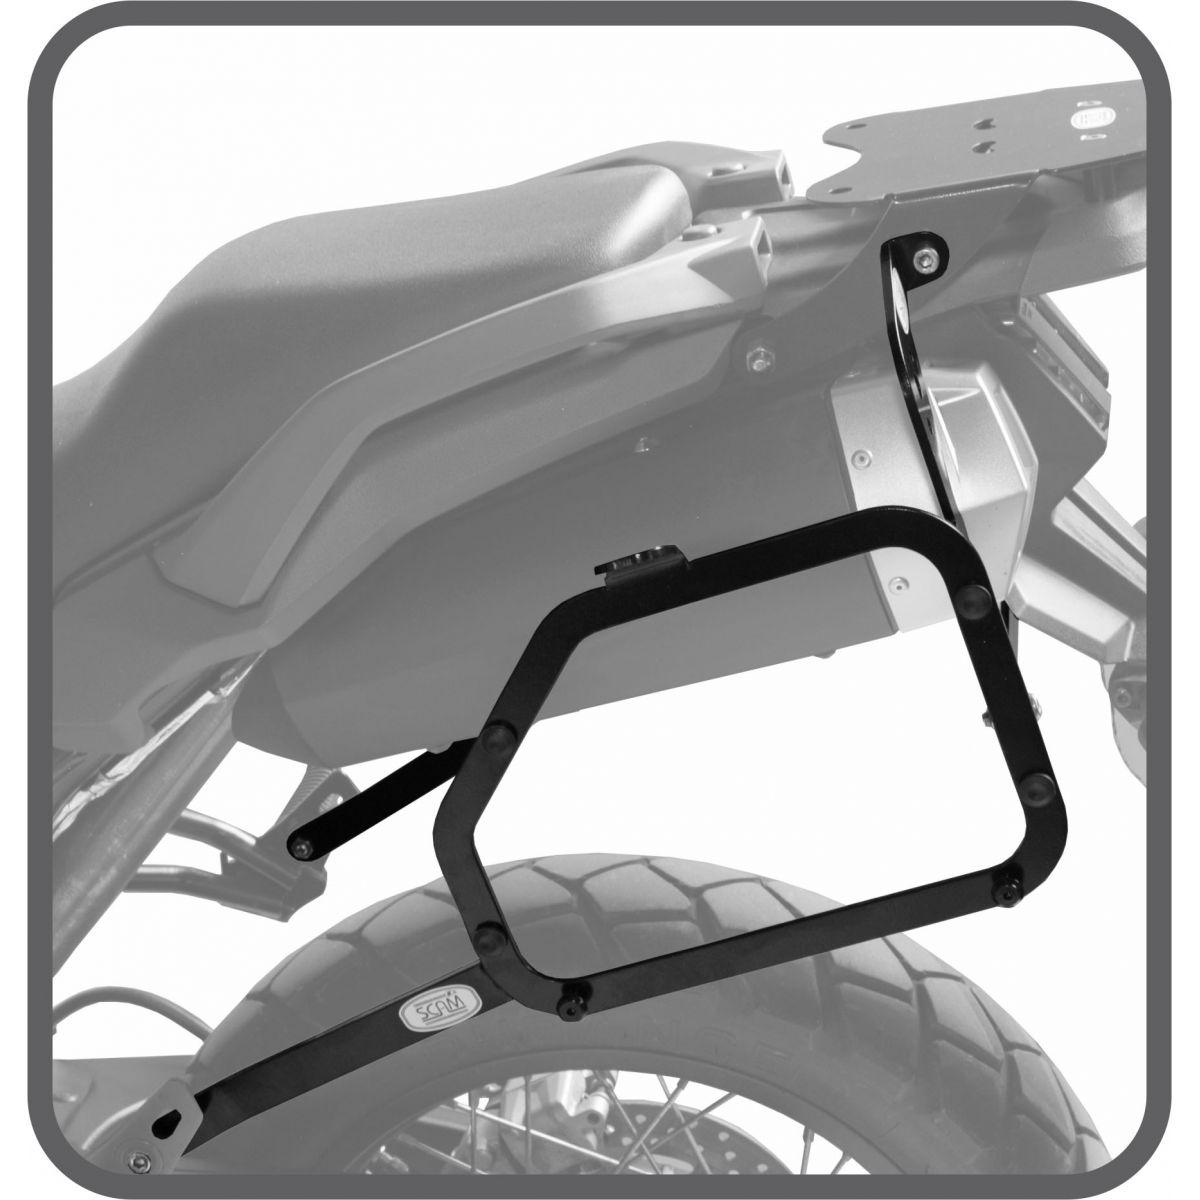 Suporte de Baú Lateral para Yamaha Tenere 660 - Scam